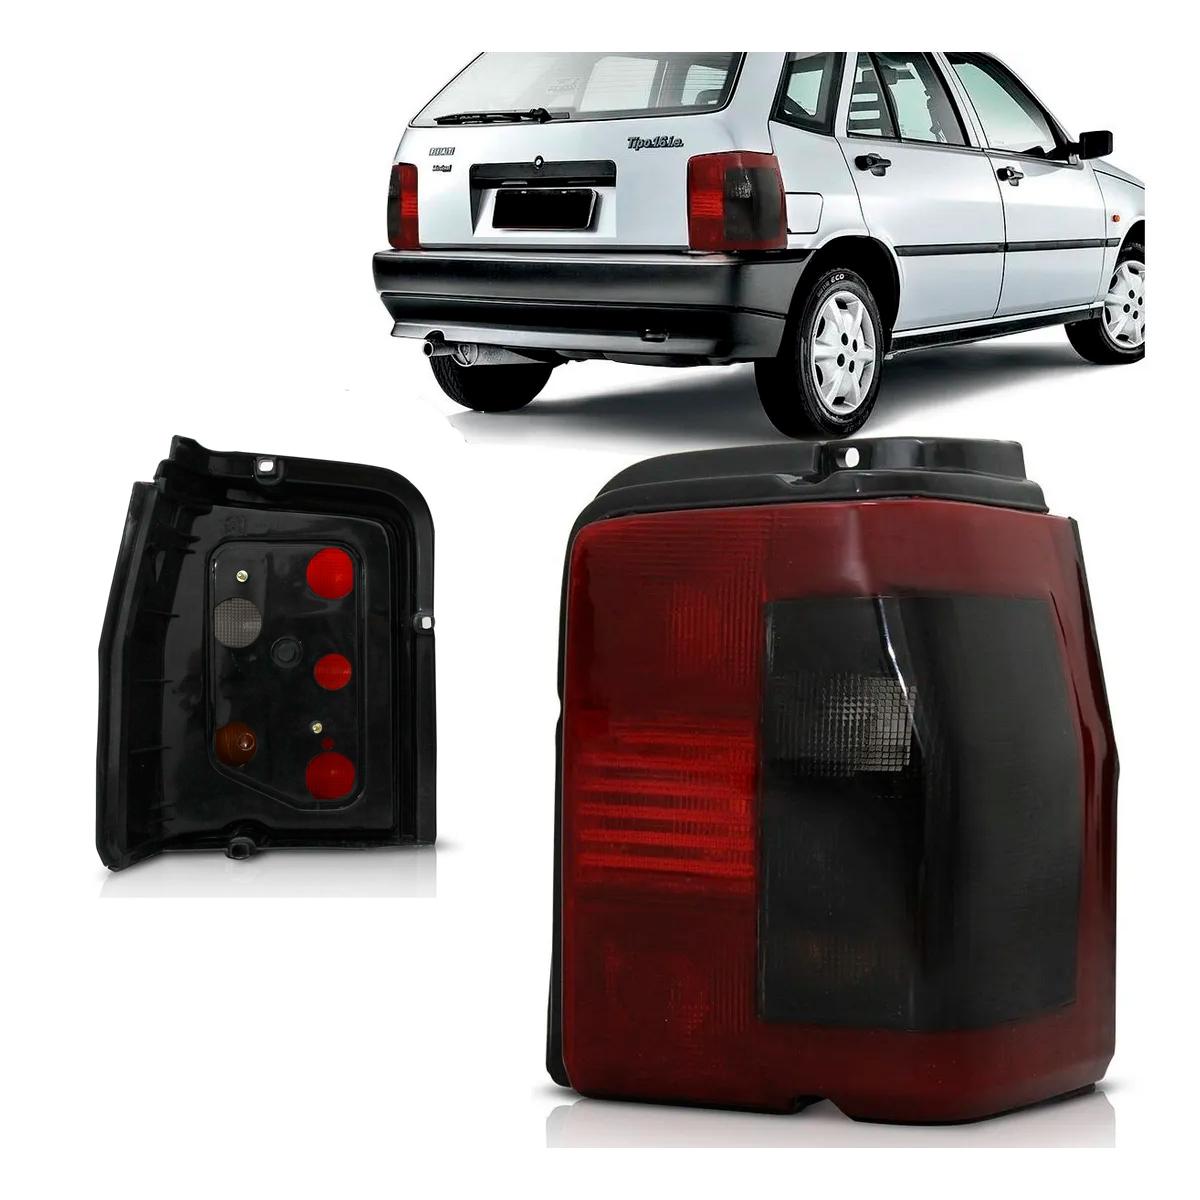 Lanterna Traseira Fiat Tipo 1993 a 1997 Bicolor Magneti Marelli